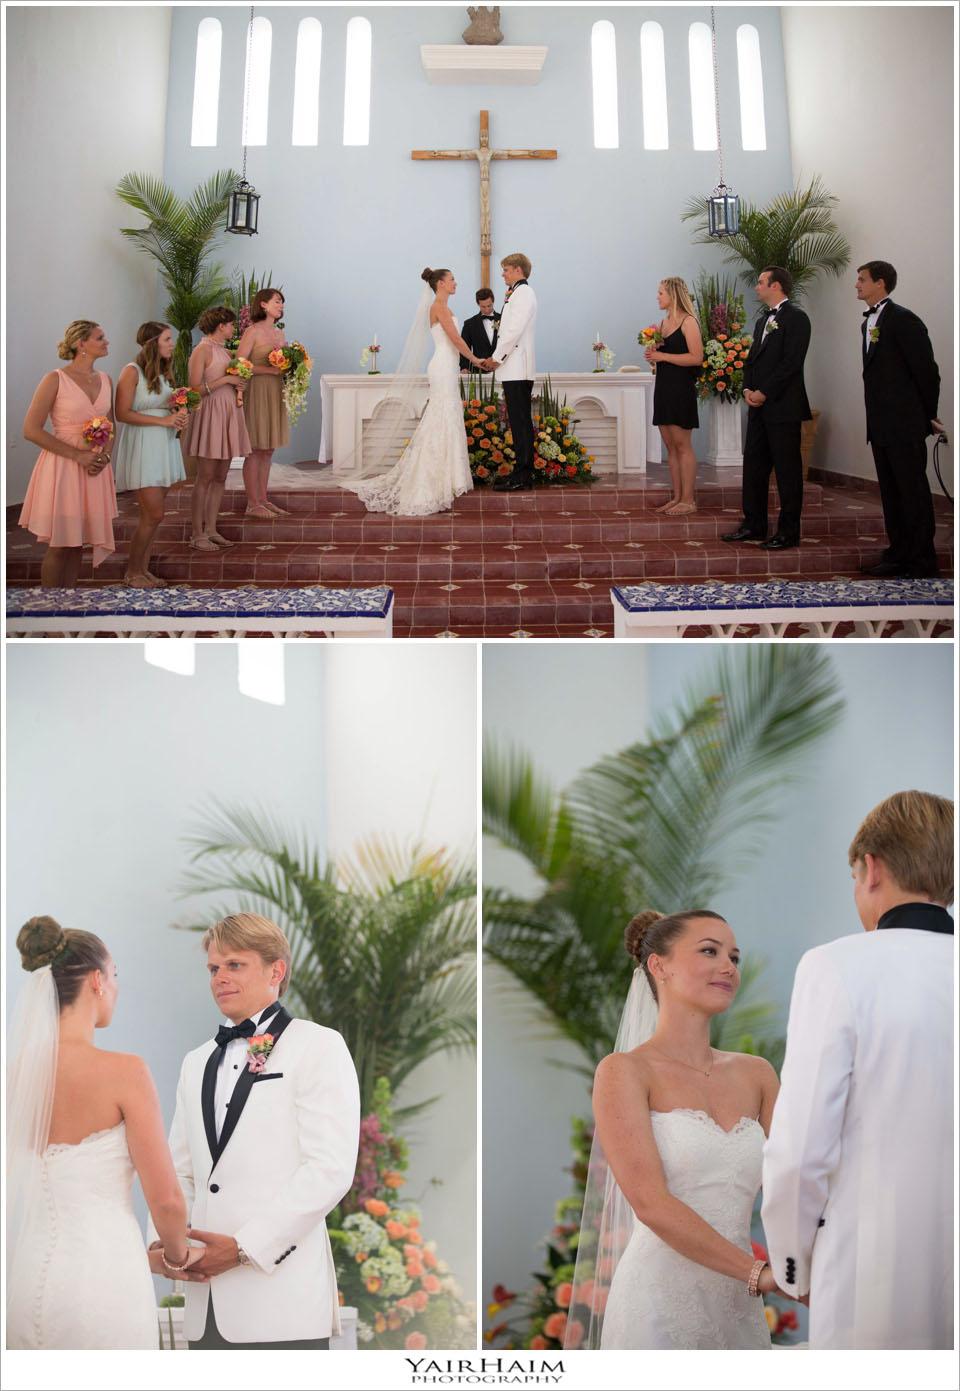 Destination-wedding-photographer-yair-haim-12